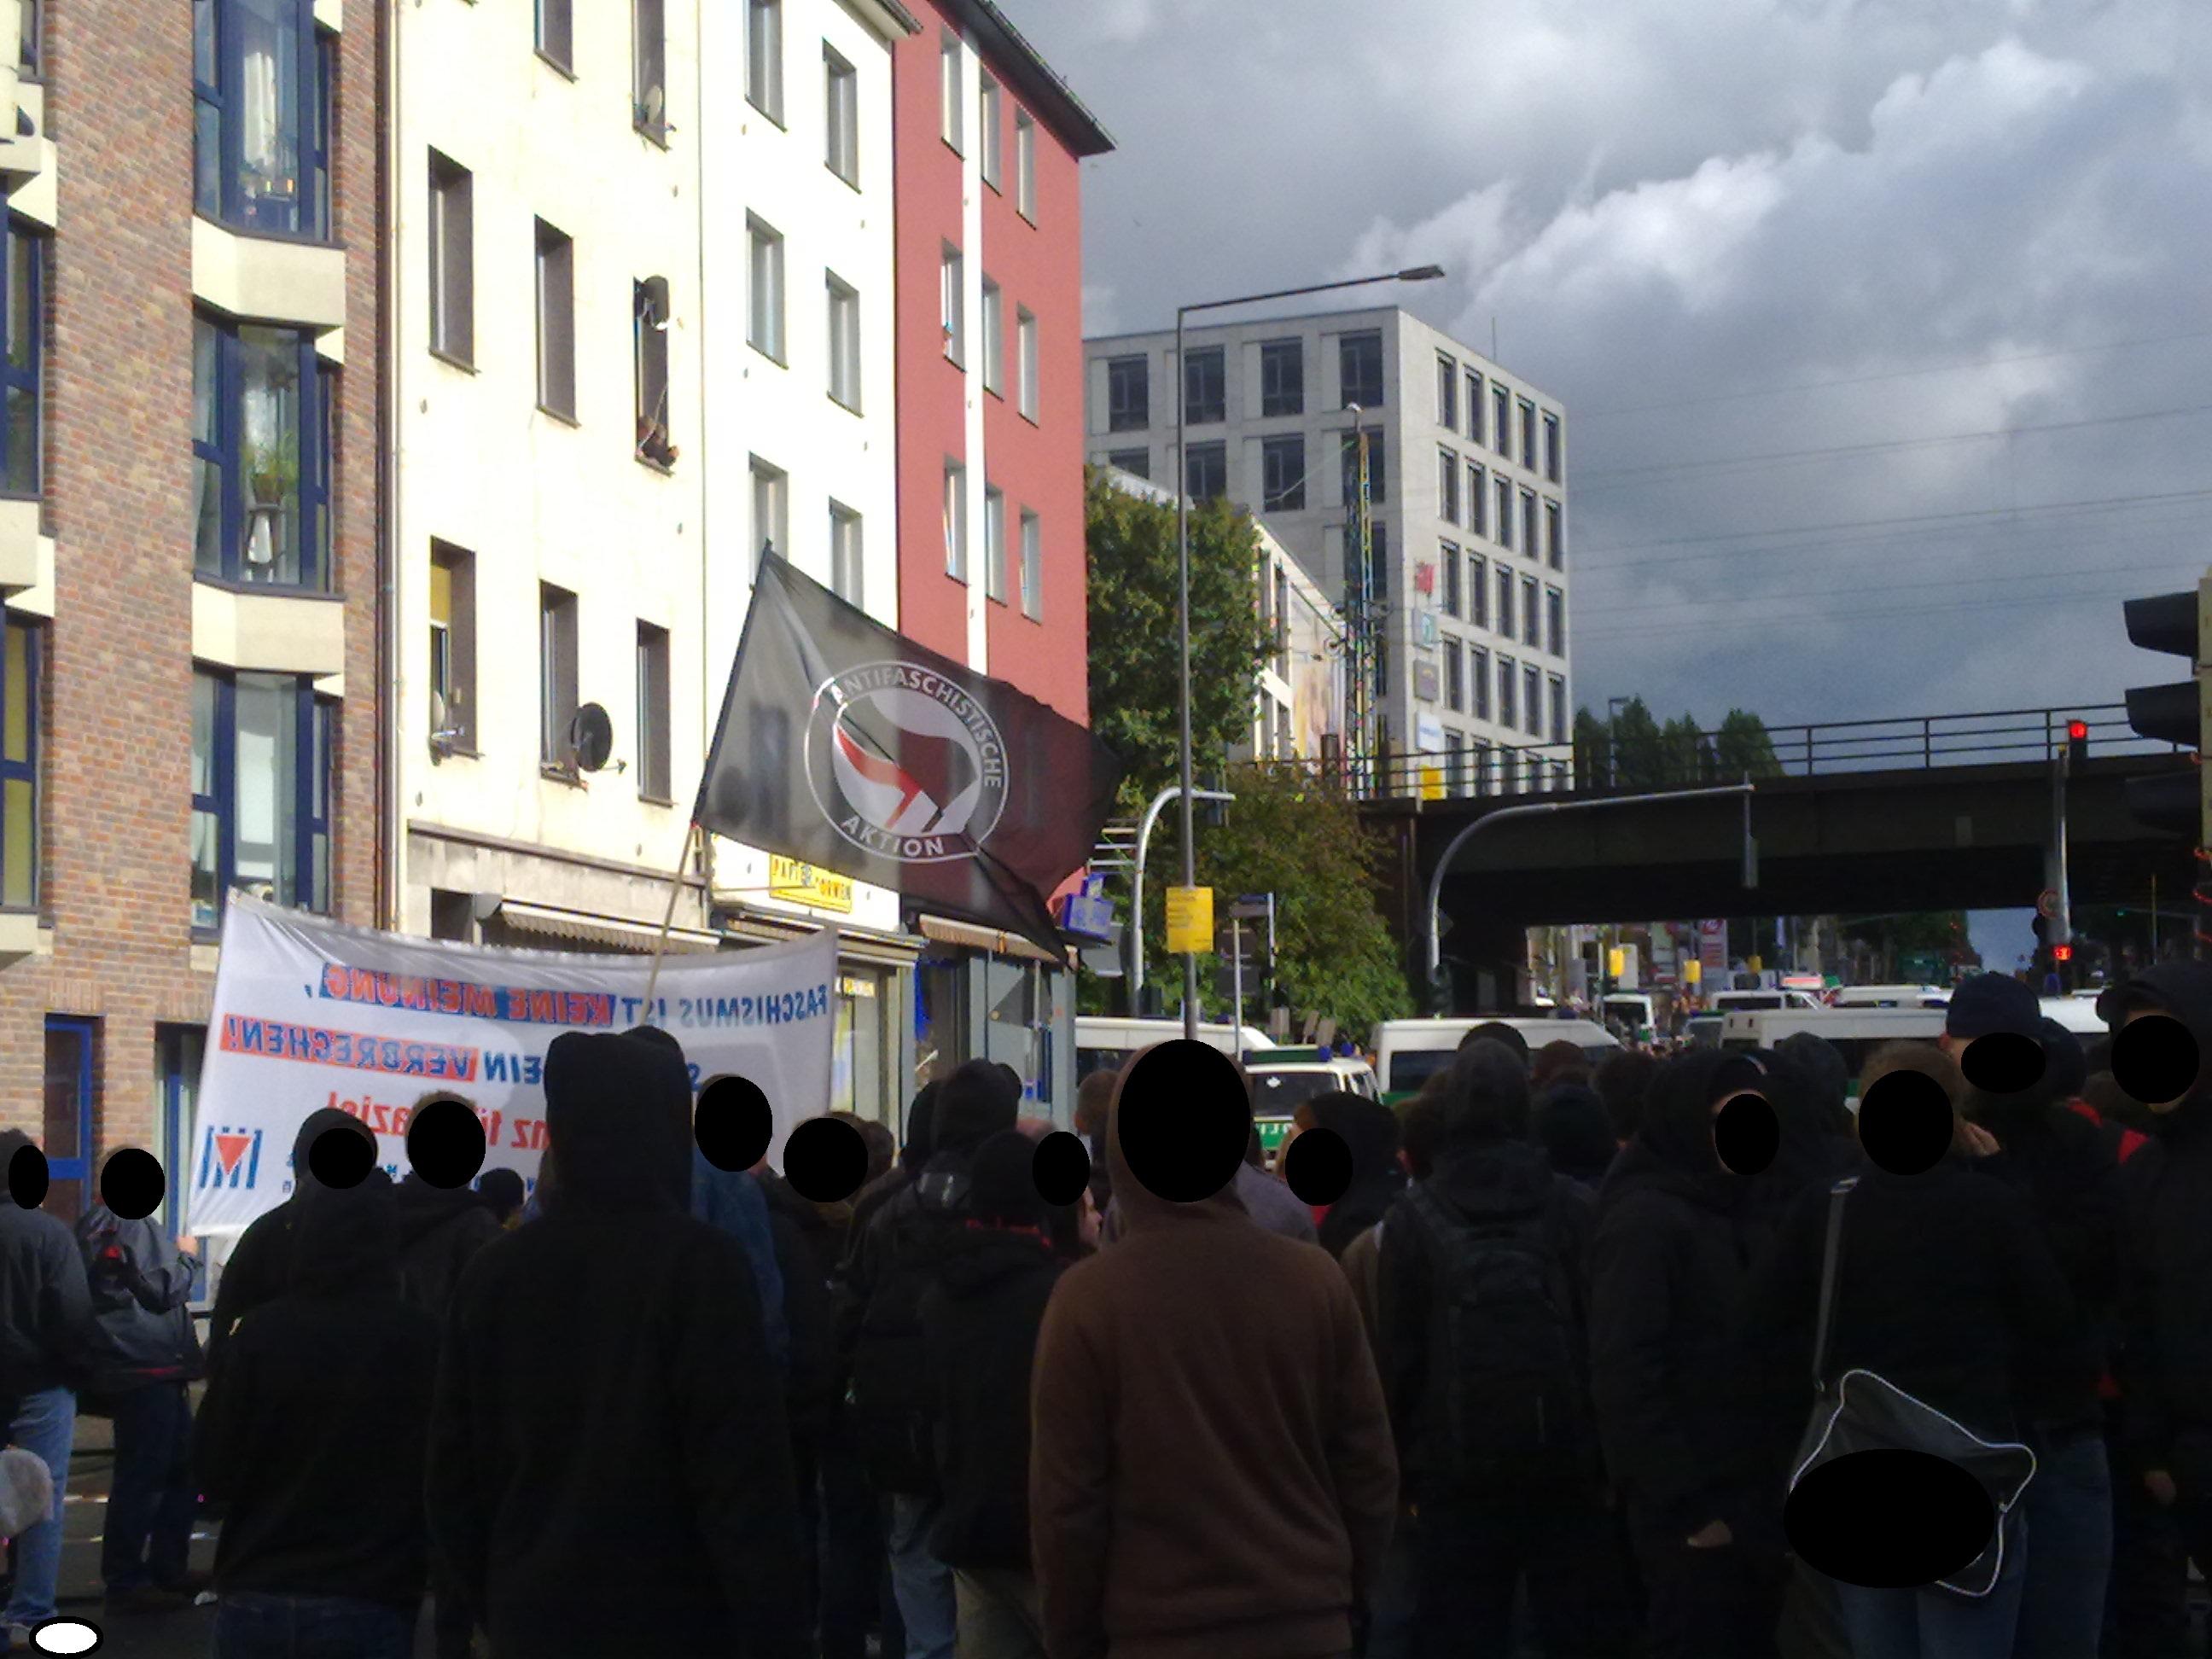 Antifa Euskirchen/Eifel gegen die Neonazi-Demo am 25.09.2010 in Aachen